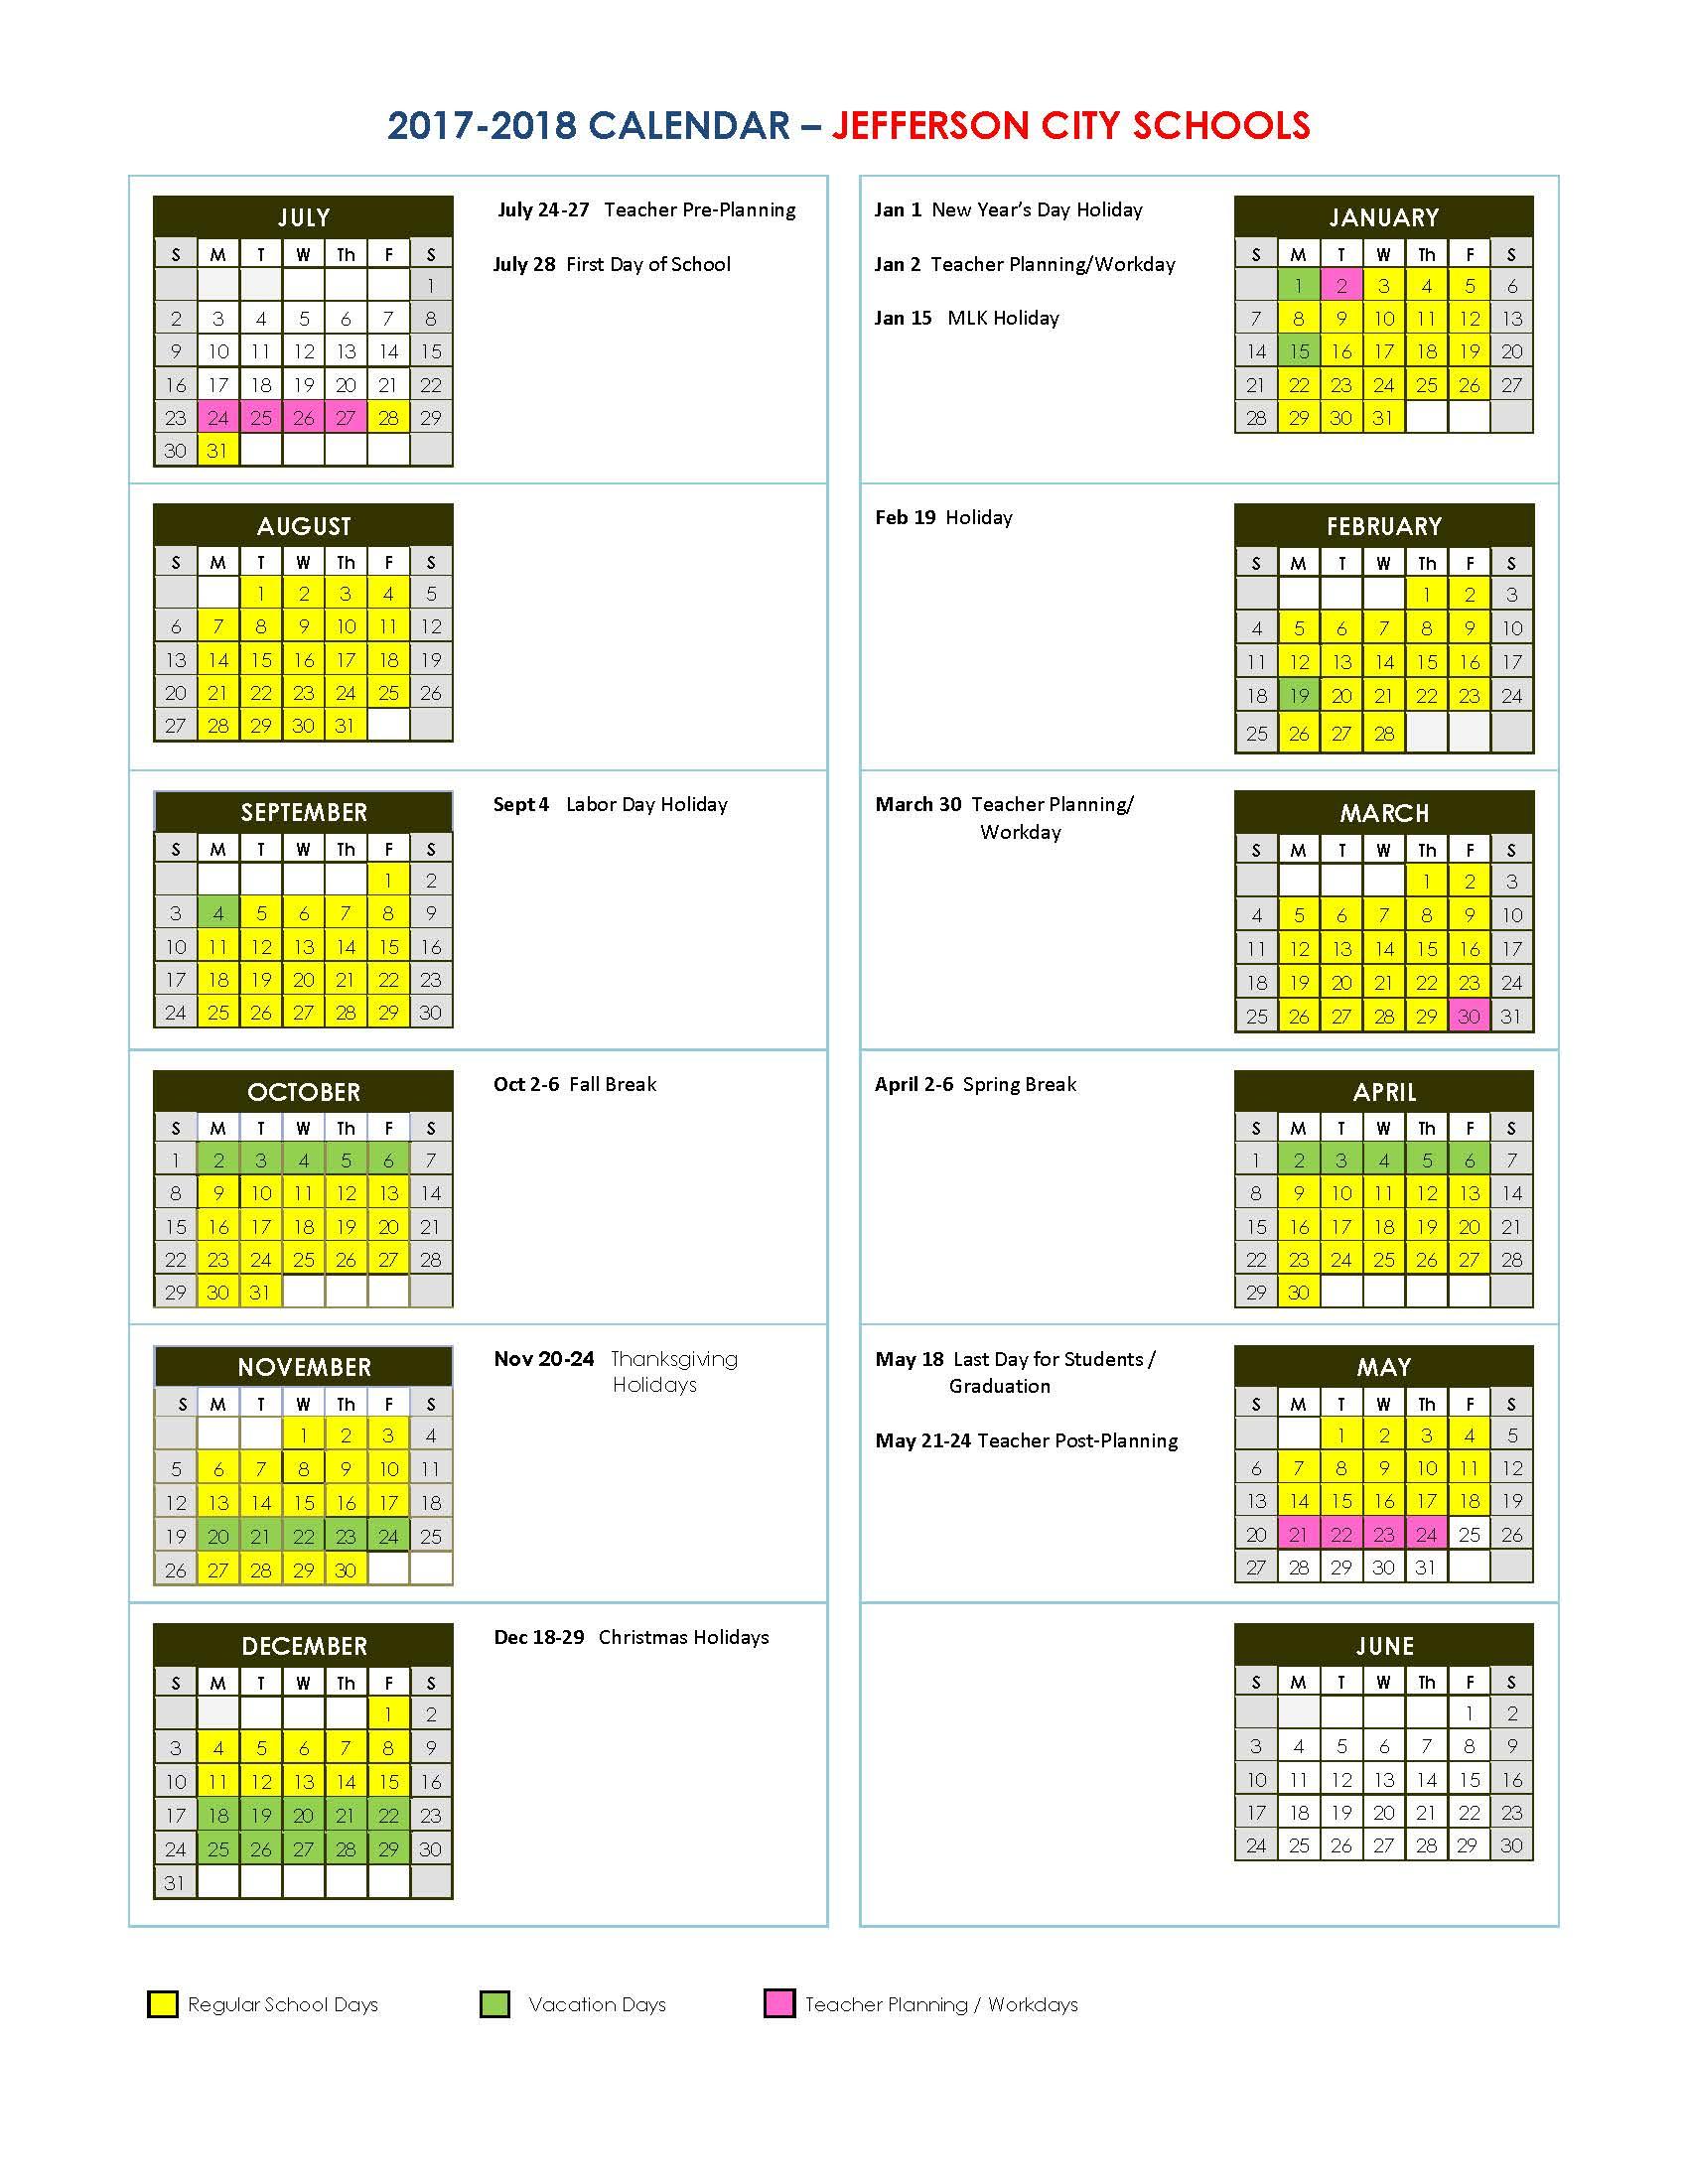 Jefferson City Schools Intended For Georgia State School Calendar 2020